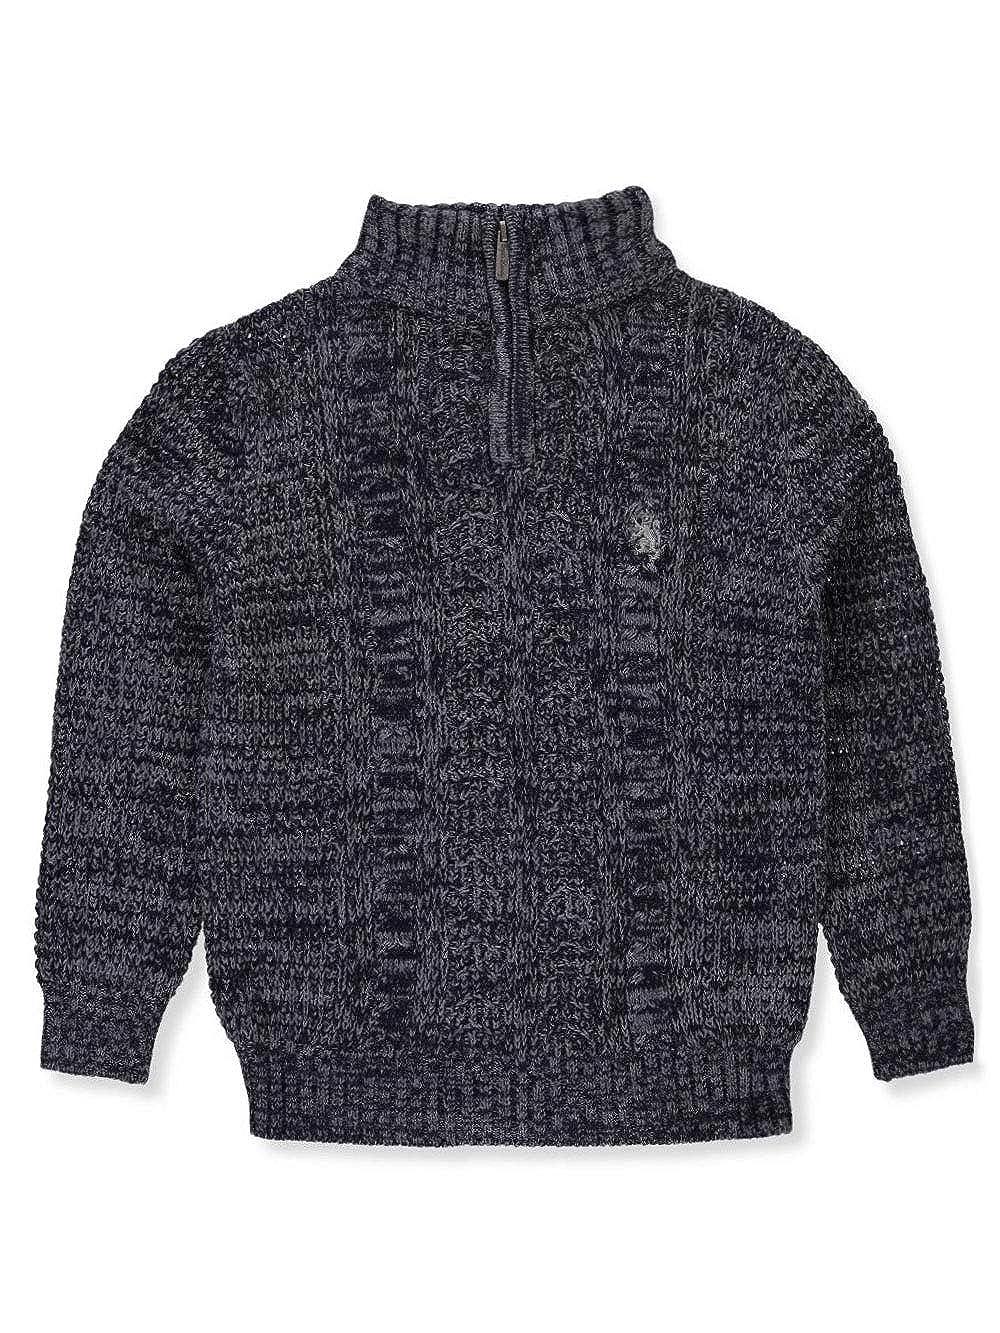 English Laundry Boys' Sweater